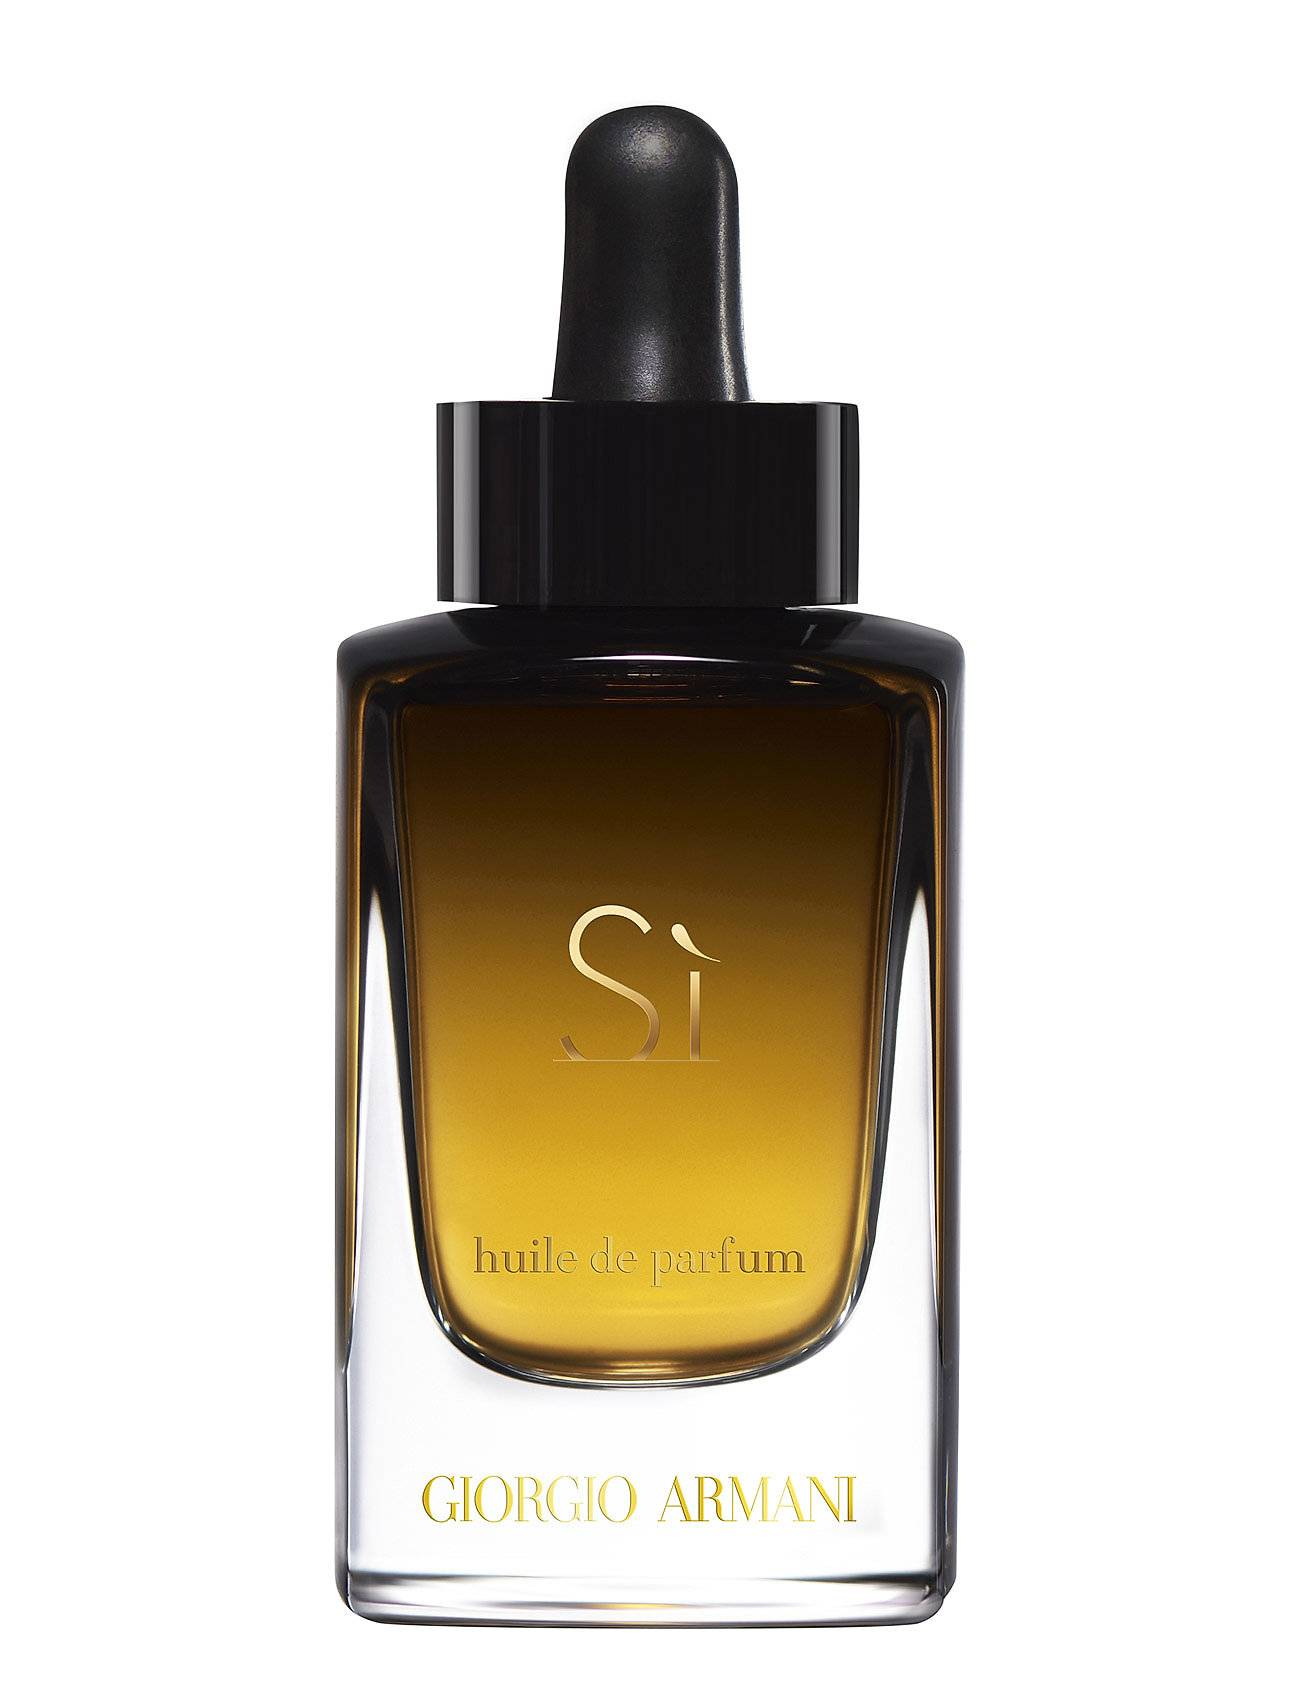 Image of Giorgio Armani Si Perfume Oil Eau De Parfum 30ml Tuoksuöljy Nude